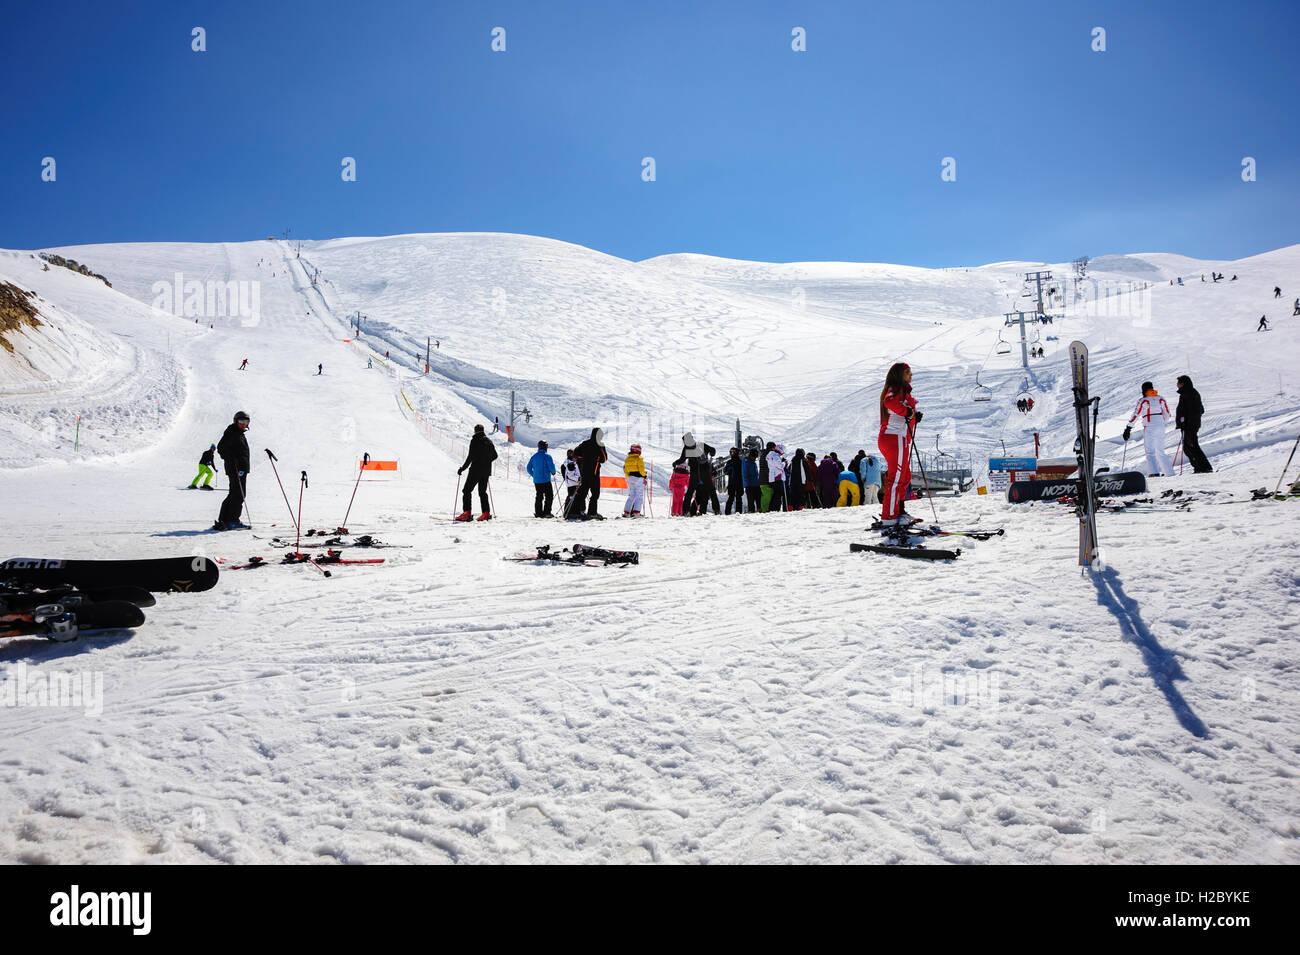 People waiting to take the chairlift, Faraya (Mzaar Kfardebian) Ski resort, Lebanon - Stock Image